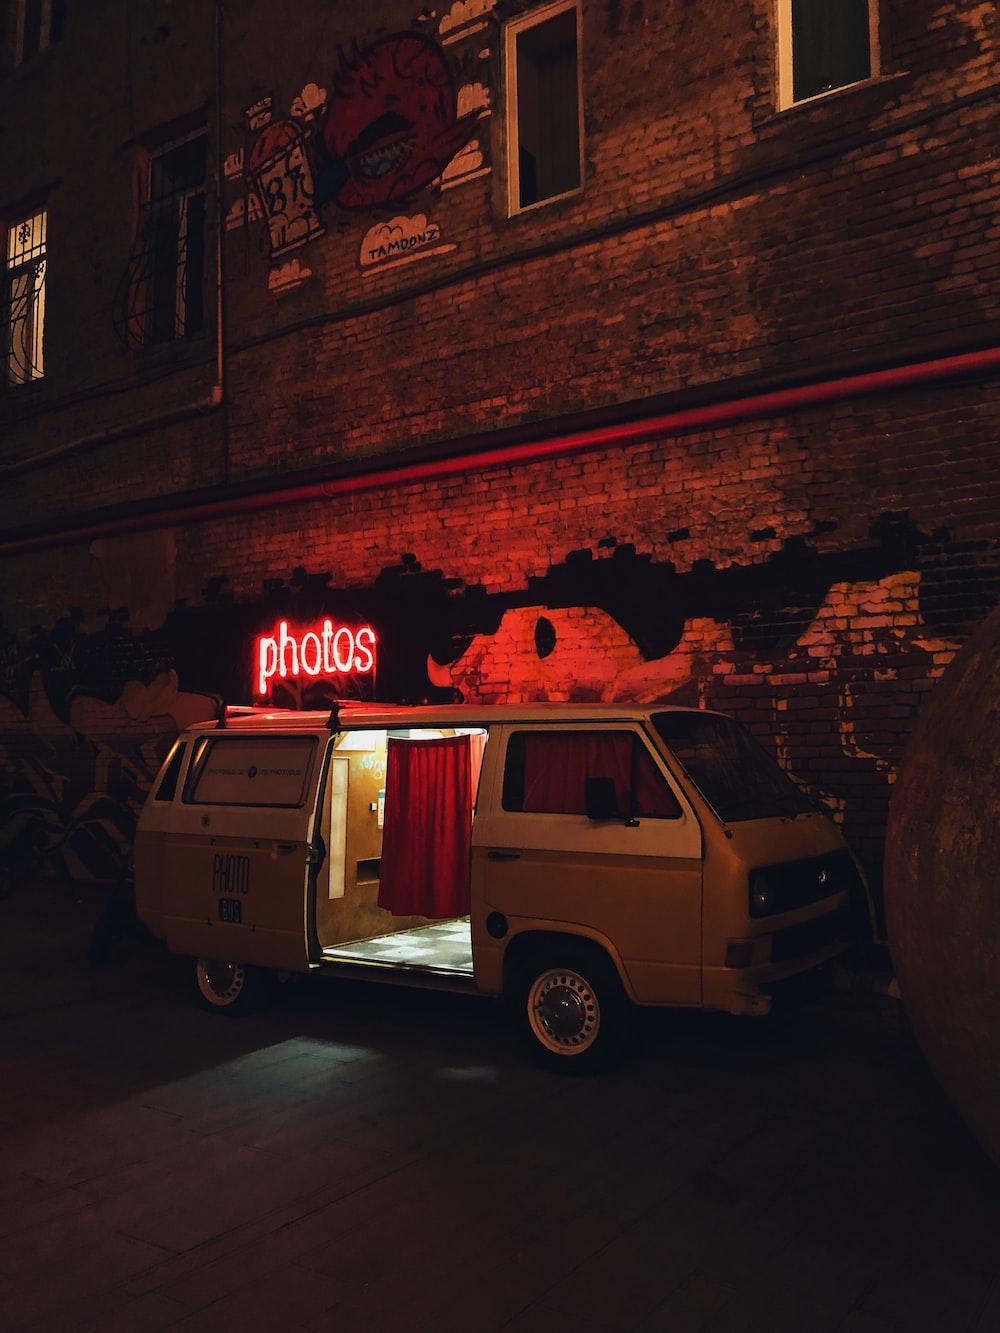 van parking beside wall at night-time